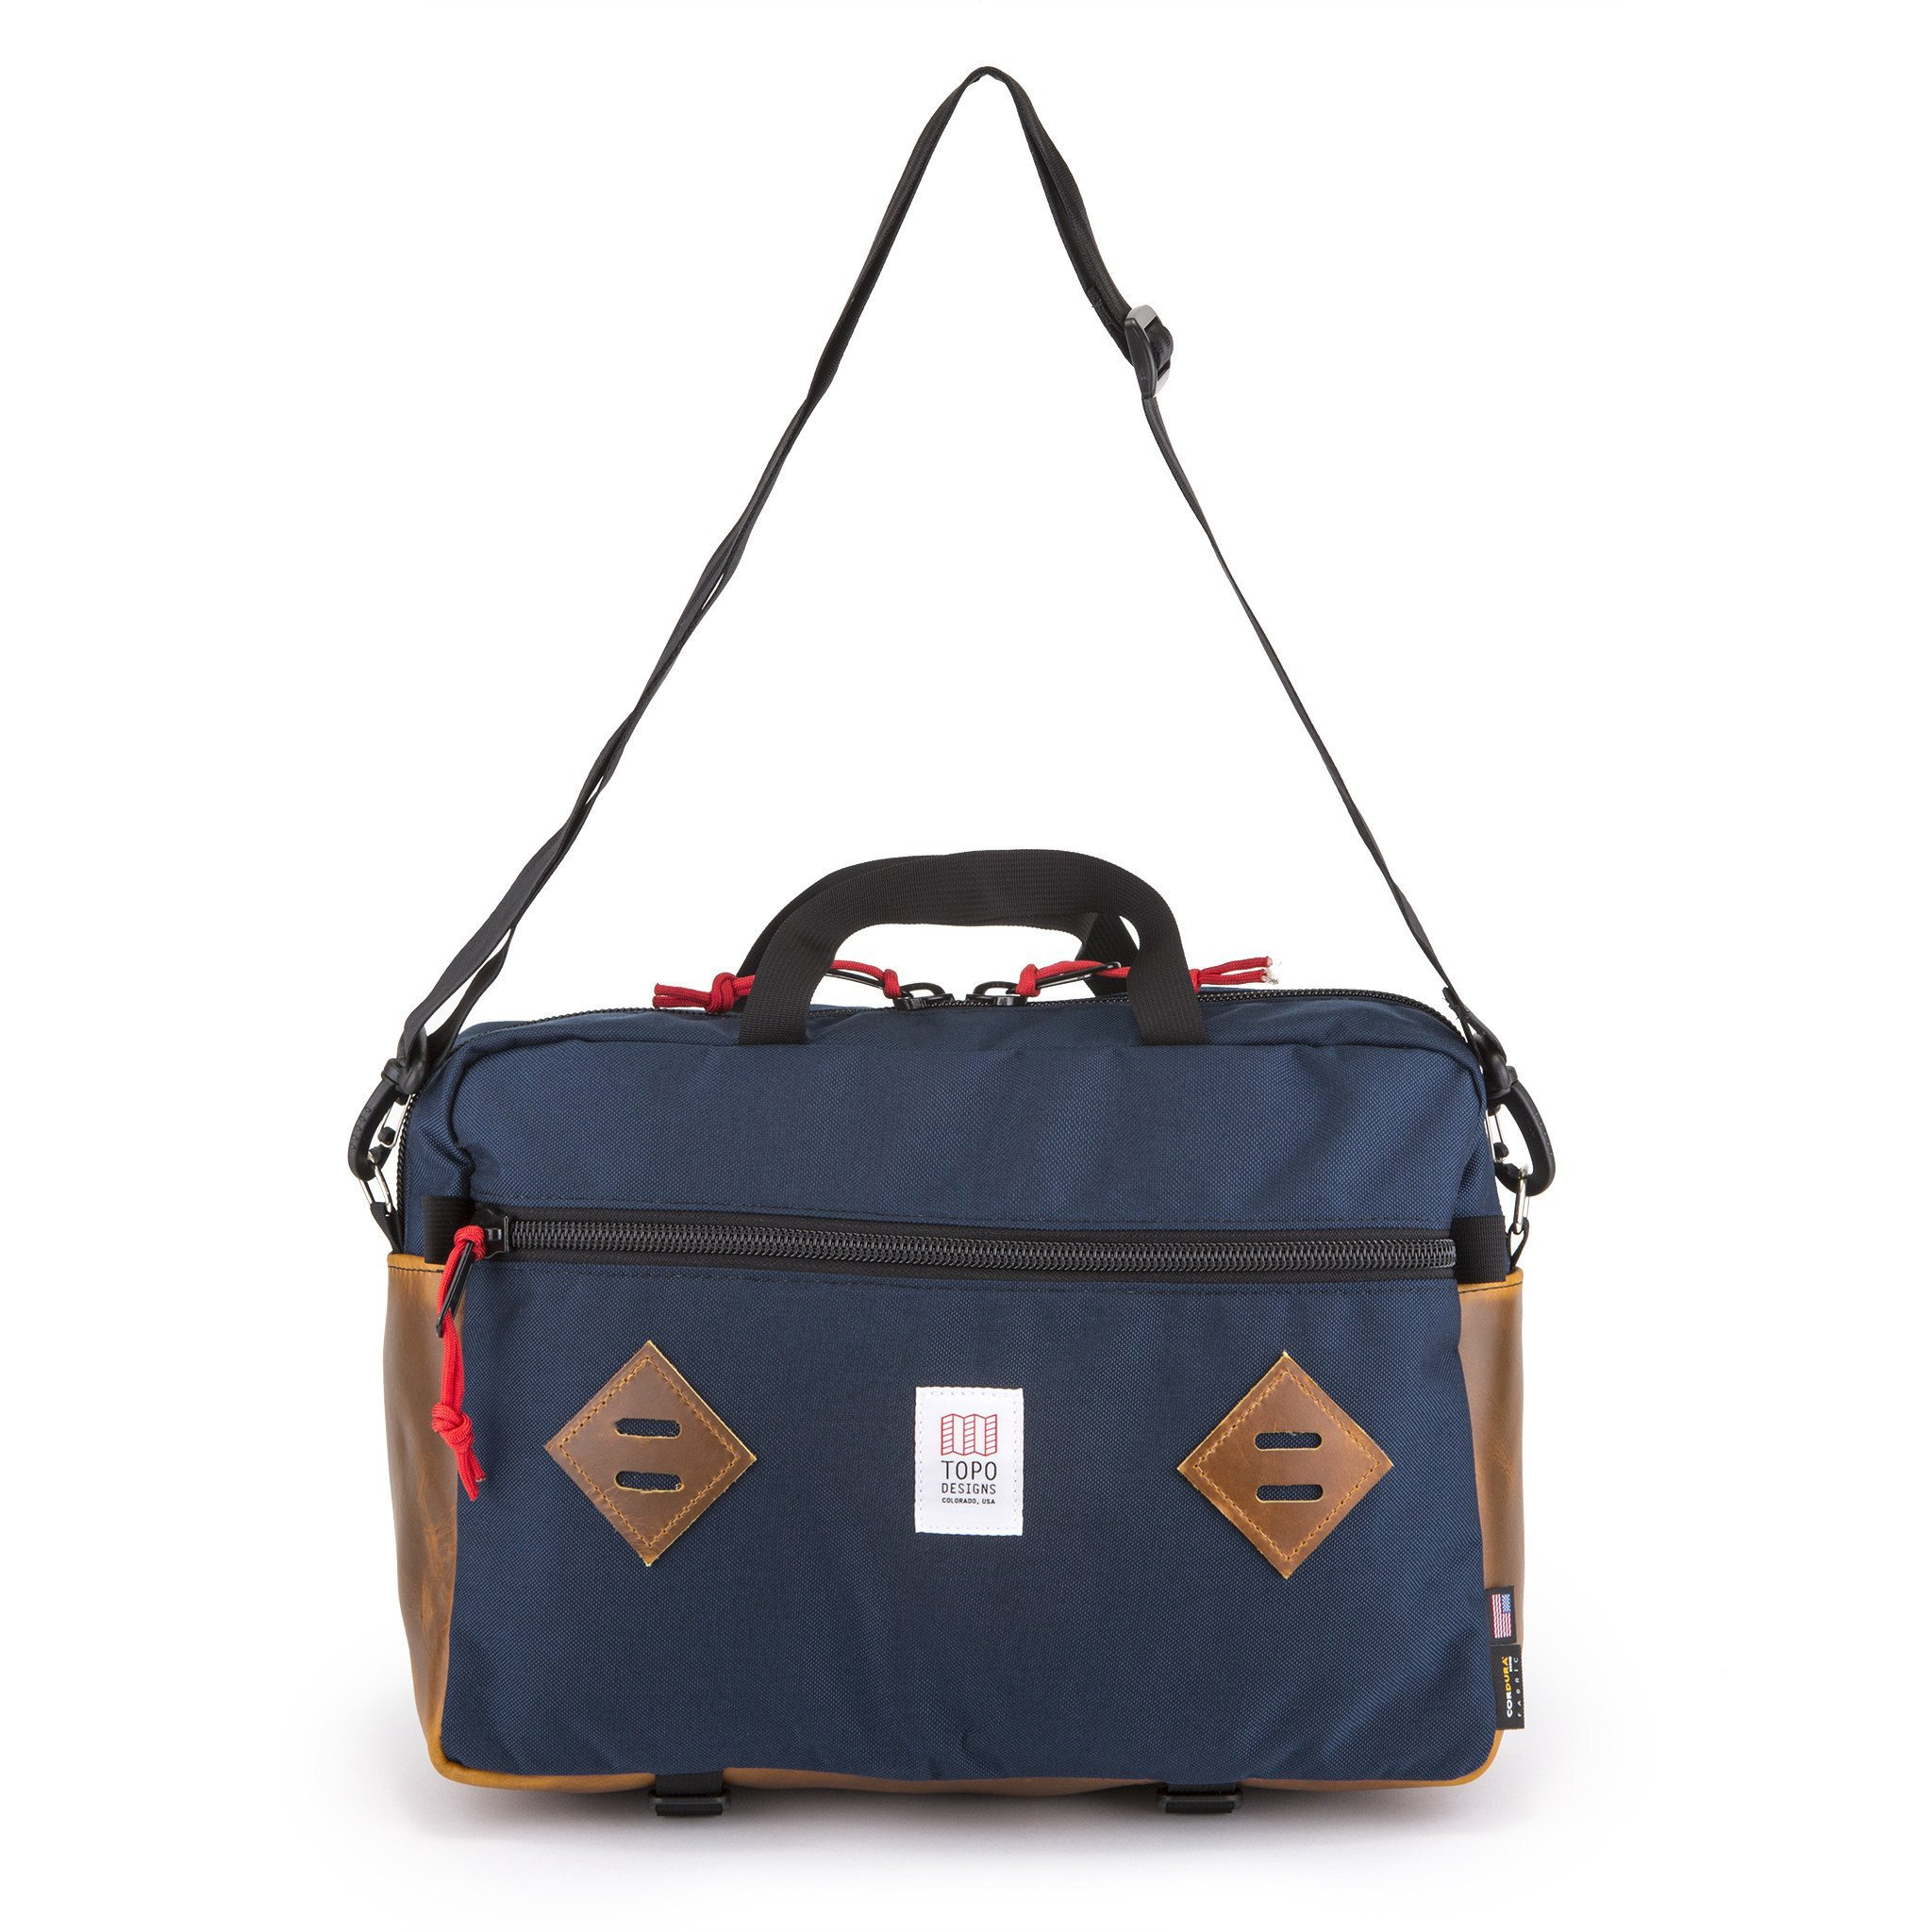 bags-mountain-briefcase-6_2048x2048.jpg